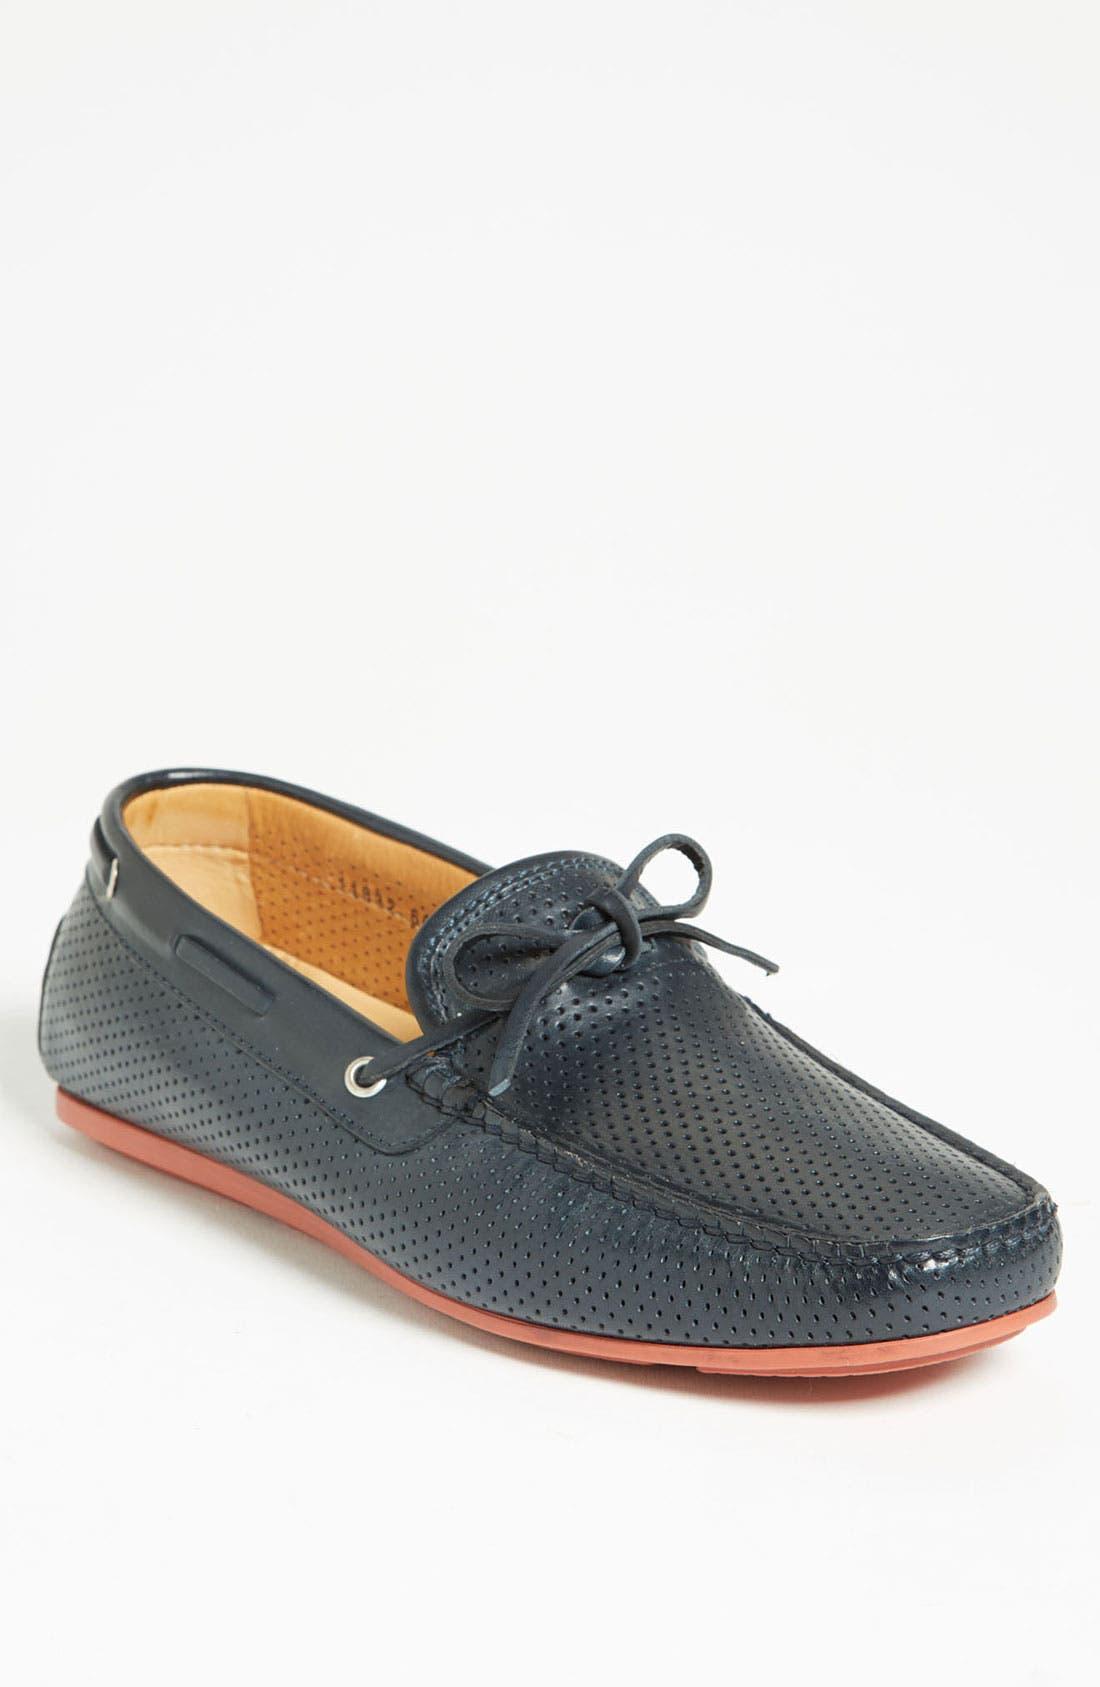 Alternate Image 1 Selected - Santoni 'Toft' Driving Shoe